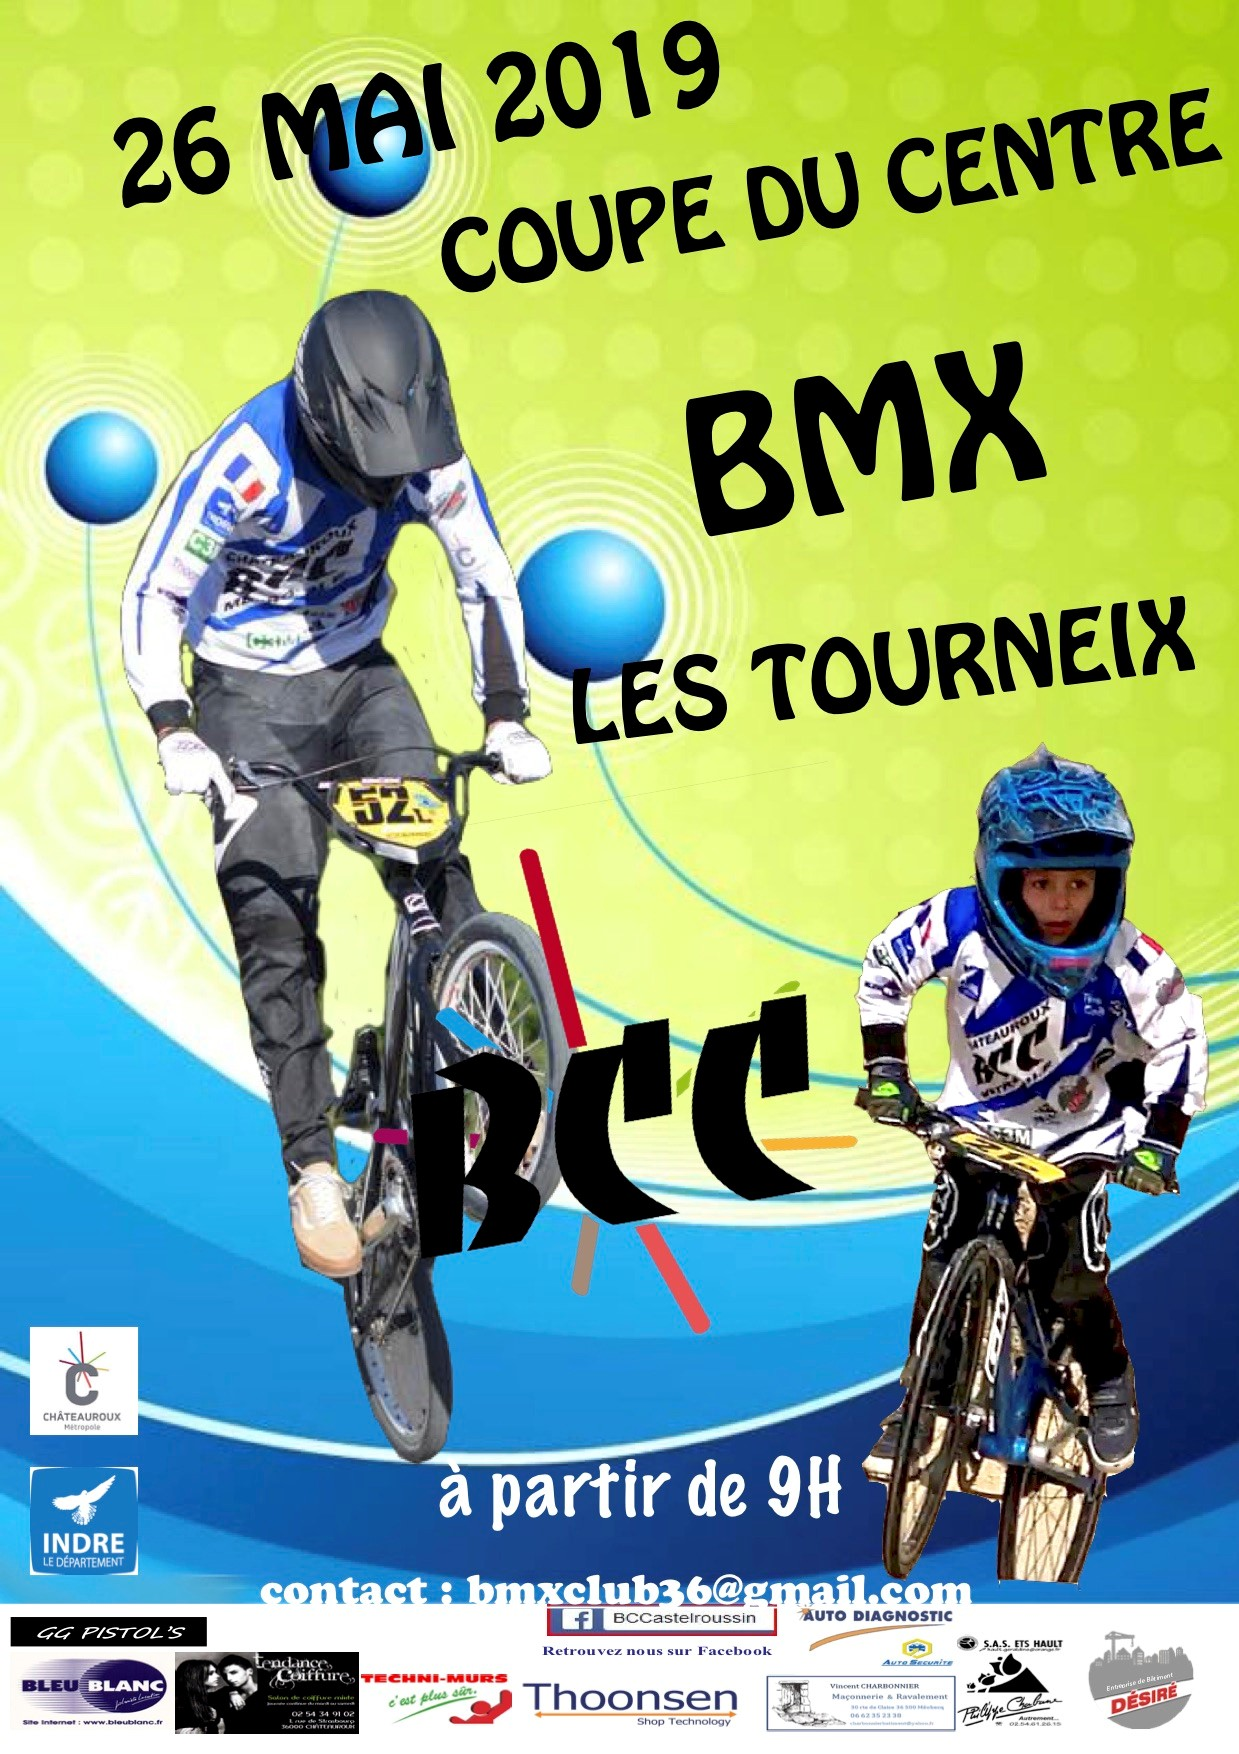 CC_Chateauroux_26052019